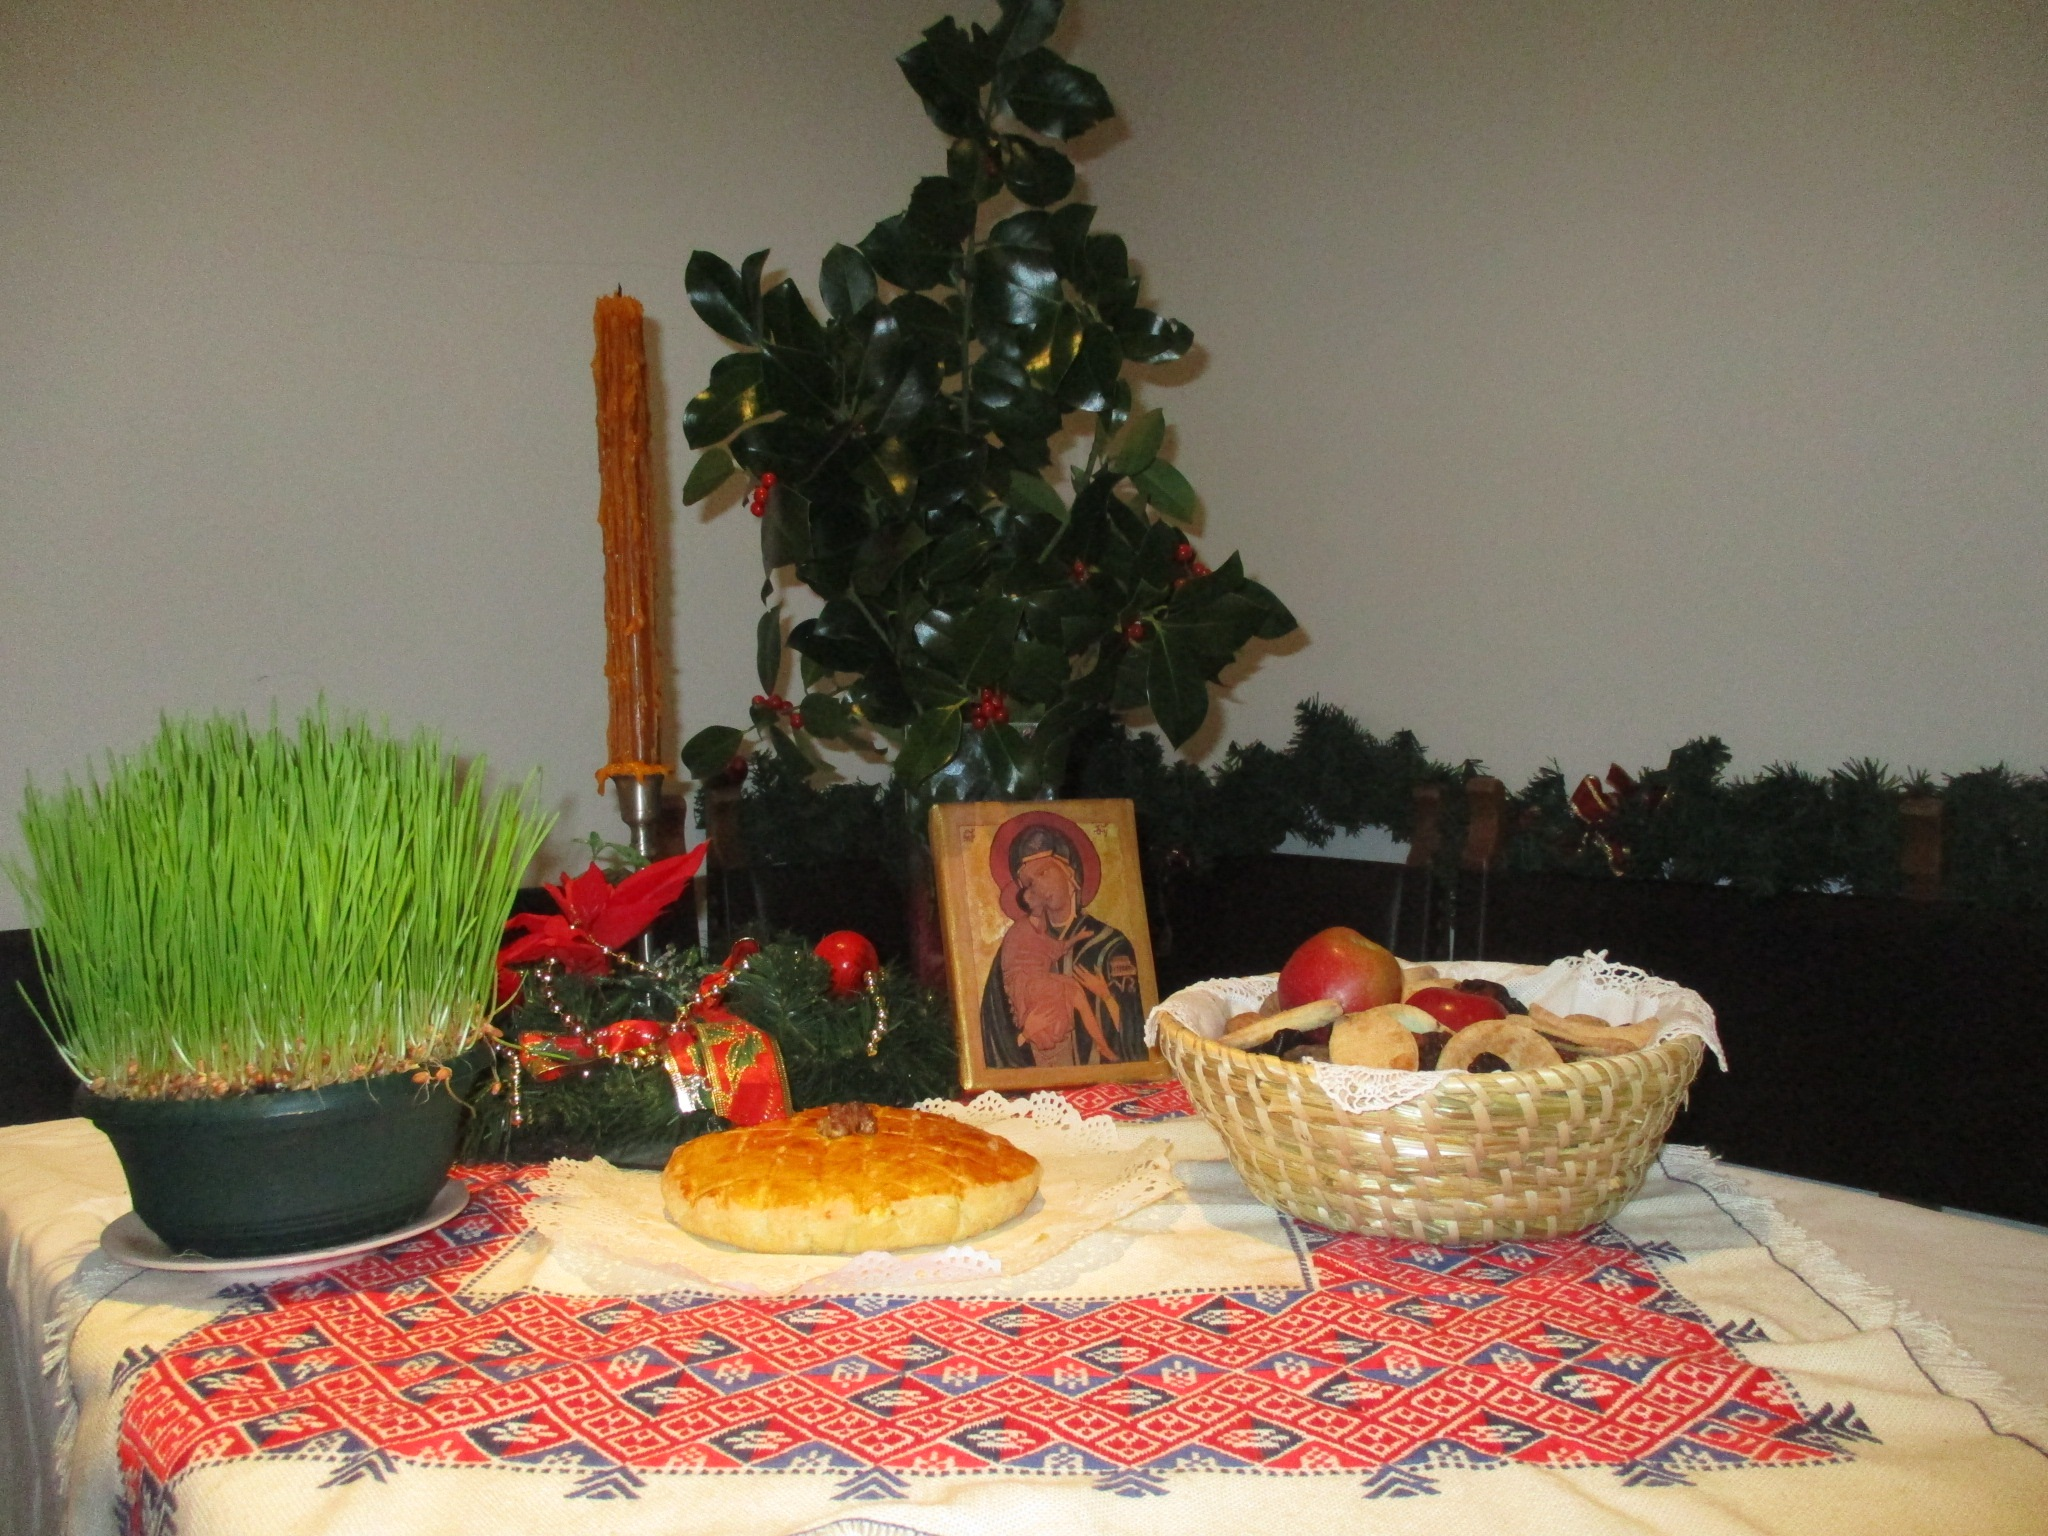 Draga braćo i sestre – čestit i blagoslovljen Božić